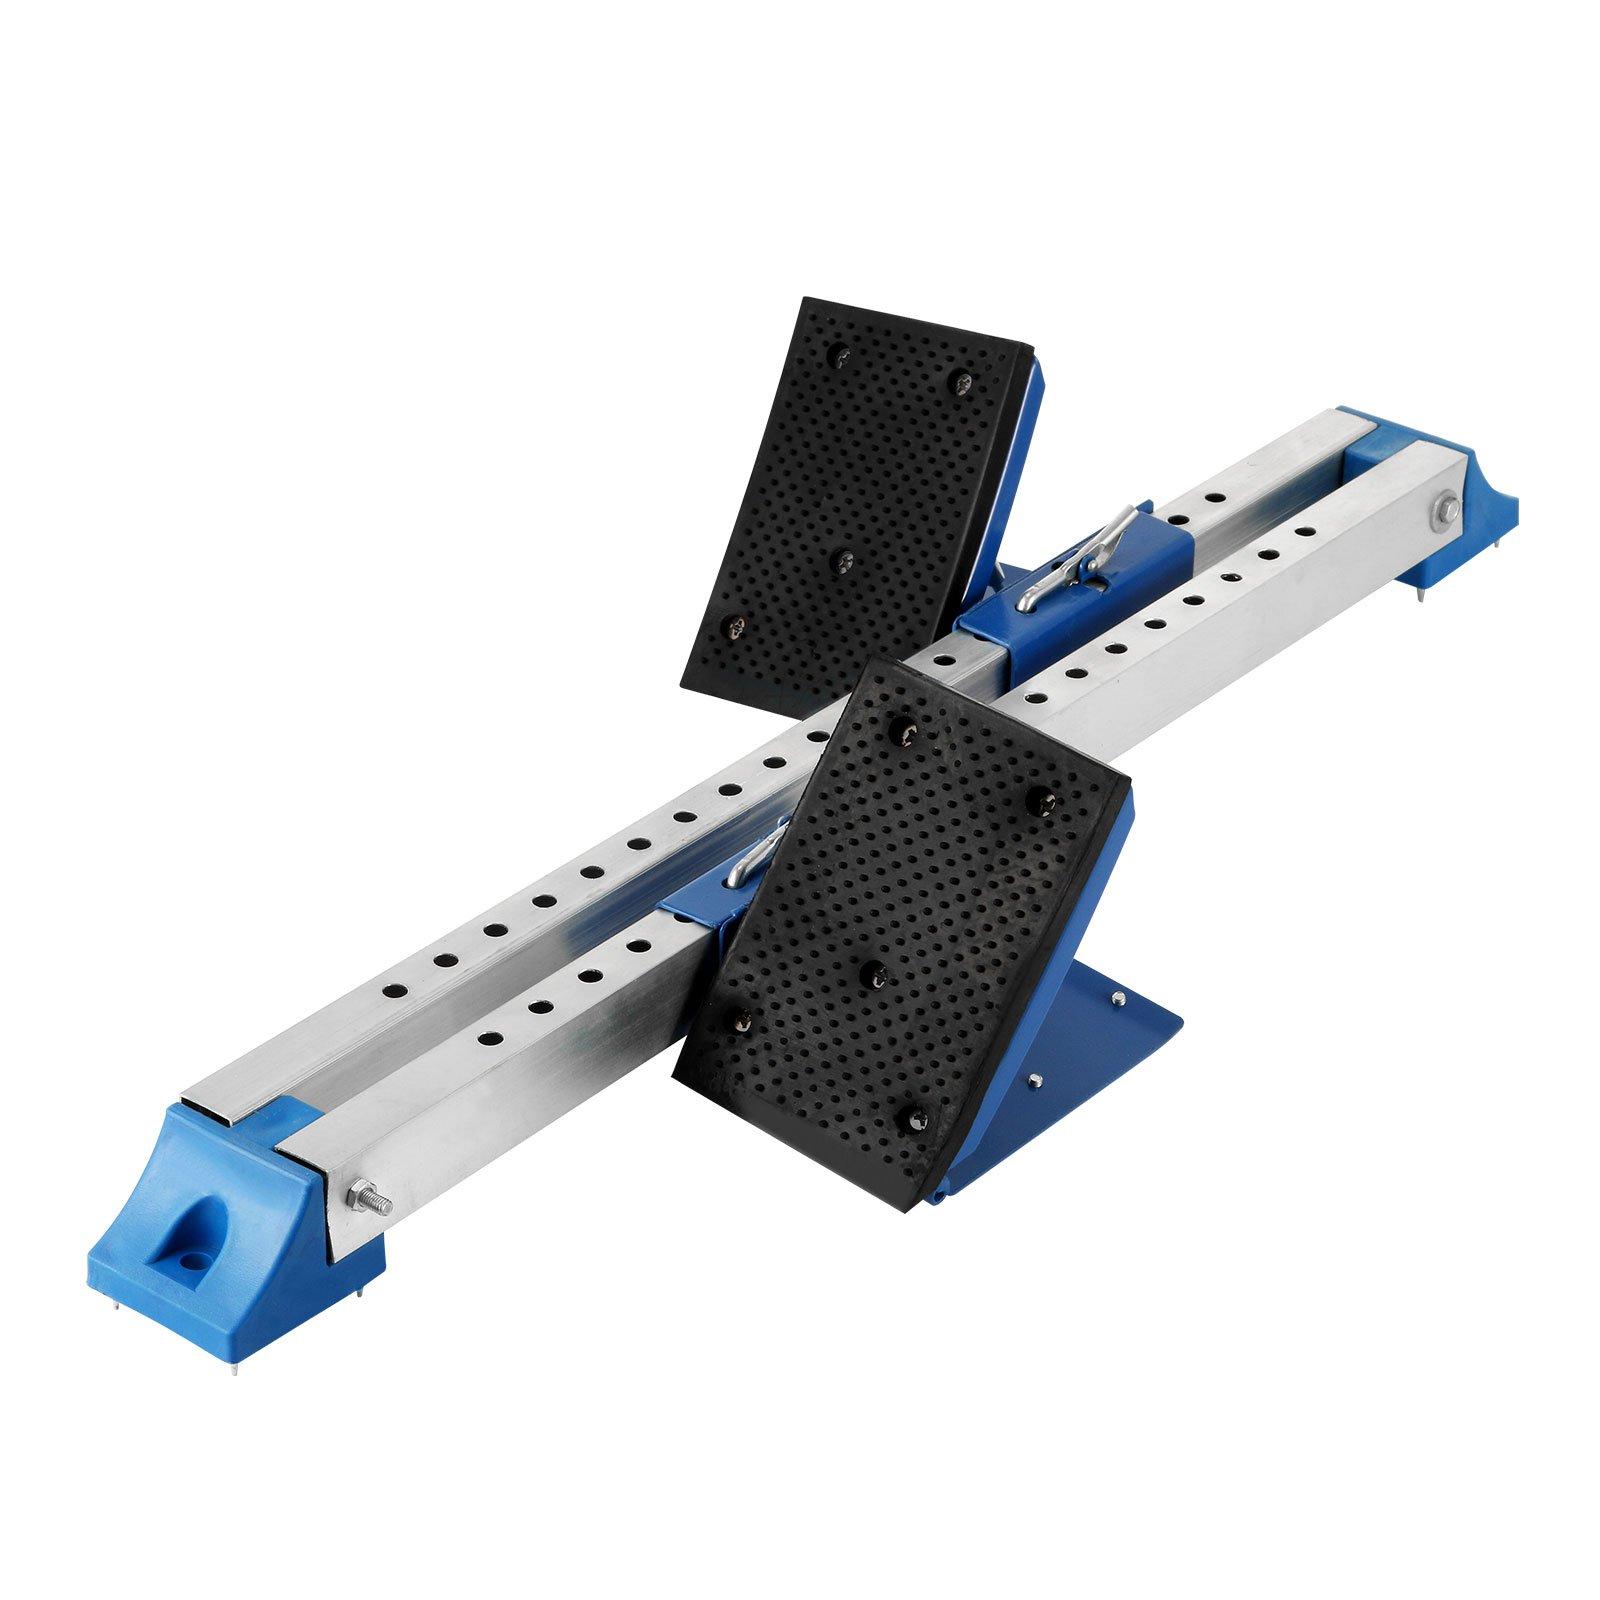 Happybuy Starting Block Multi-Function Starting Block Pedals Adjustable Sprinter Starting Block Starting Blocks Track and Field Aluminum Suitable for Plastic Runway Cinder Track (Black)